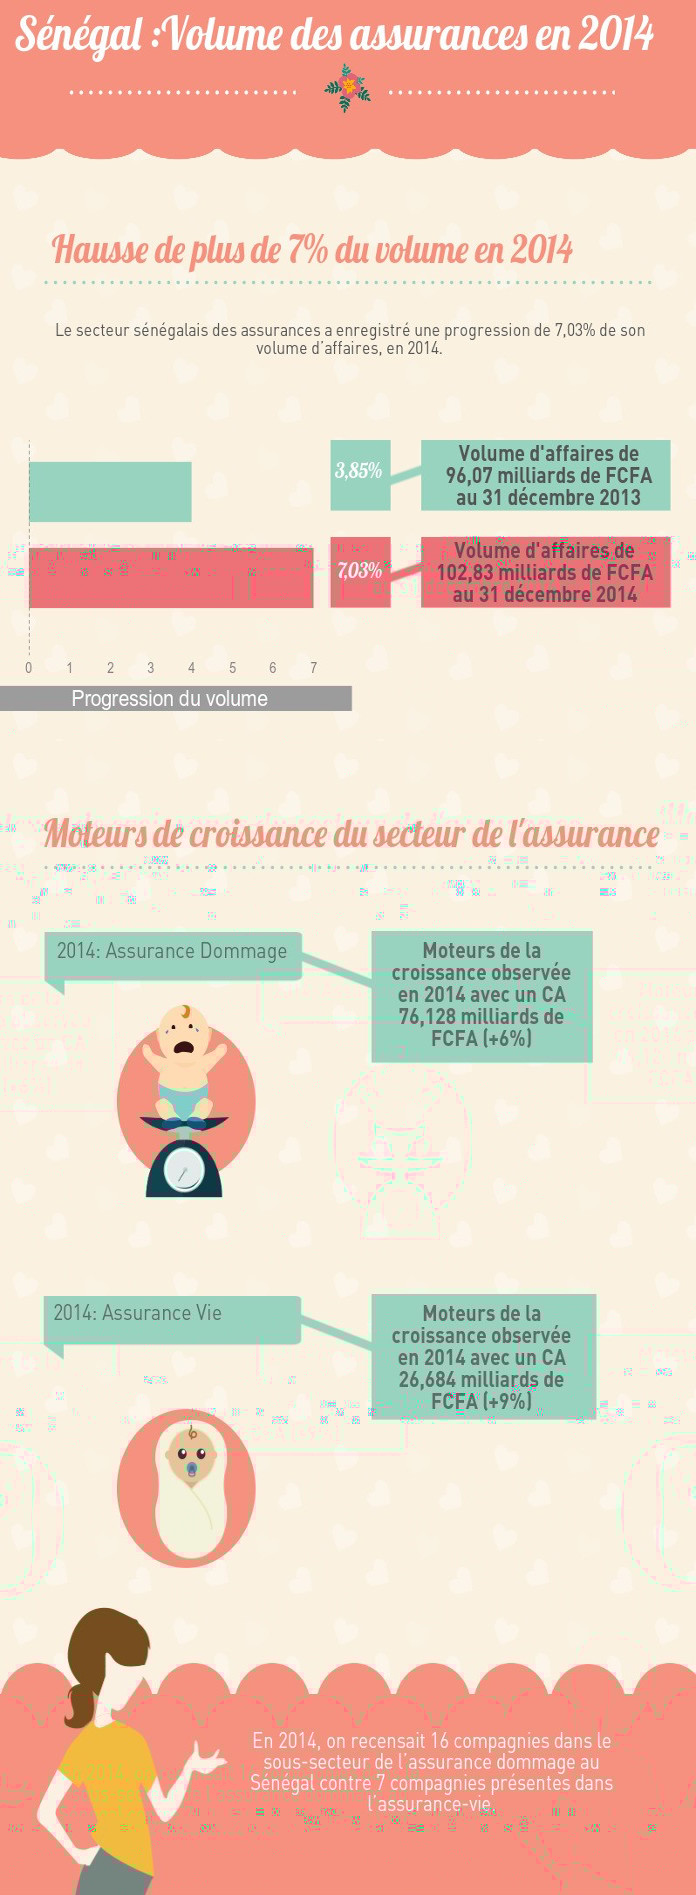 Senegal-Assurance